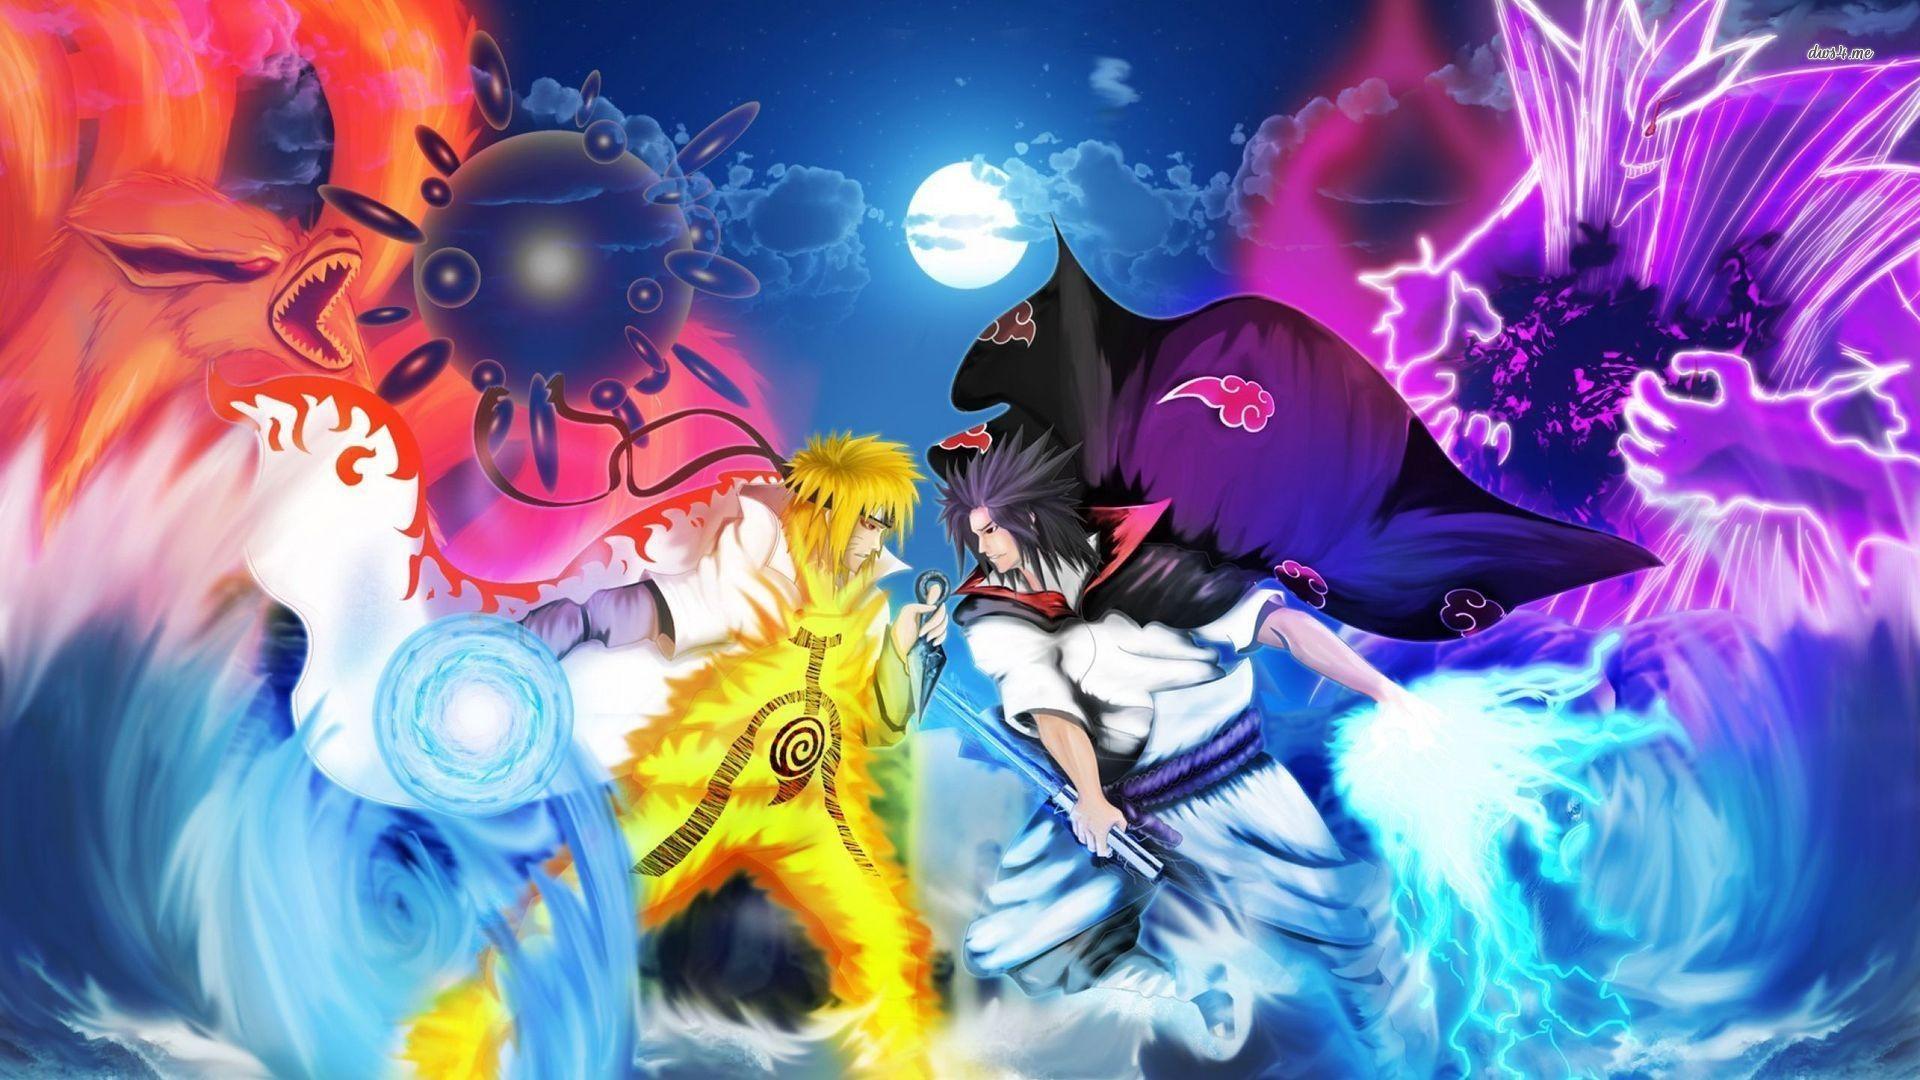 Top Wallpaper Naruto Desktop - 728665-download-free-wallpapers-de-naruto-shippuden-hd-2018-1920x1080-notebook  Collection_96381.jpg